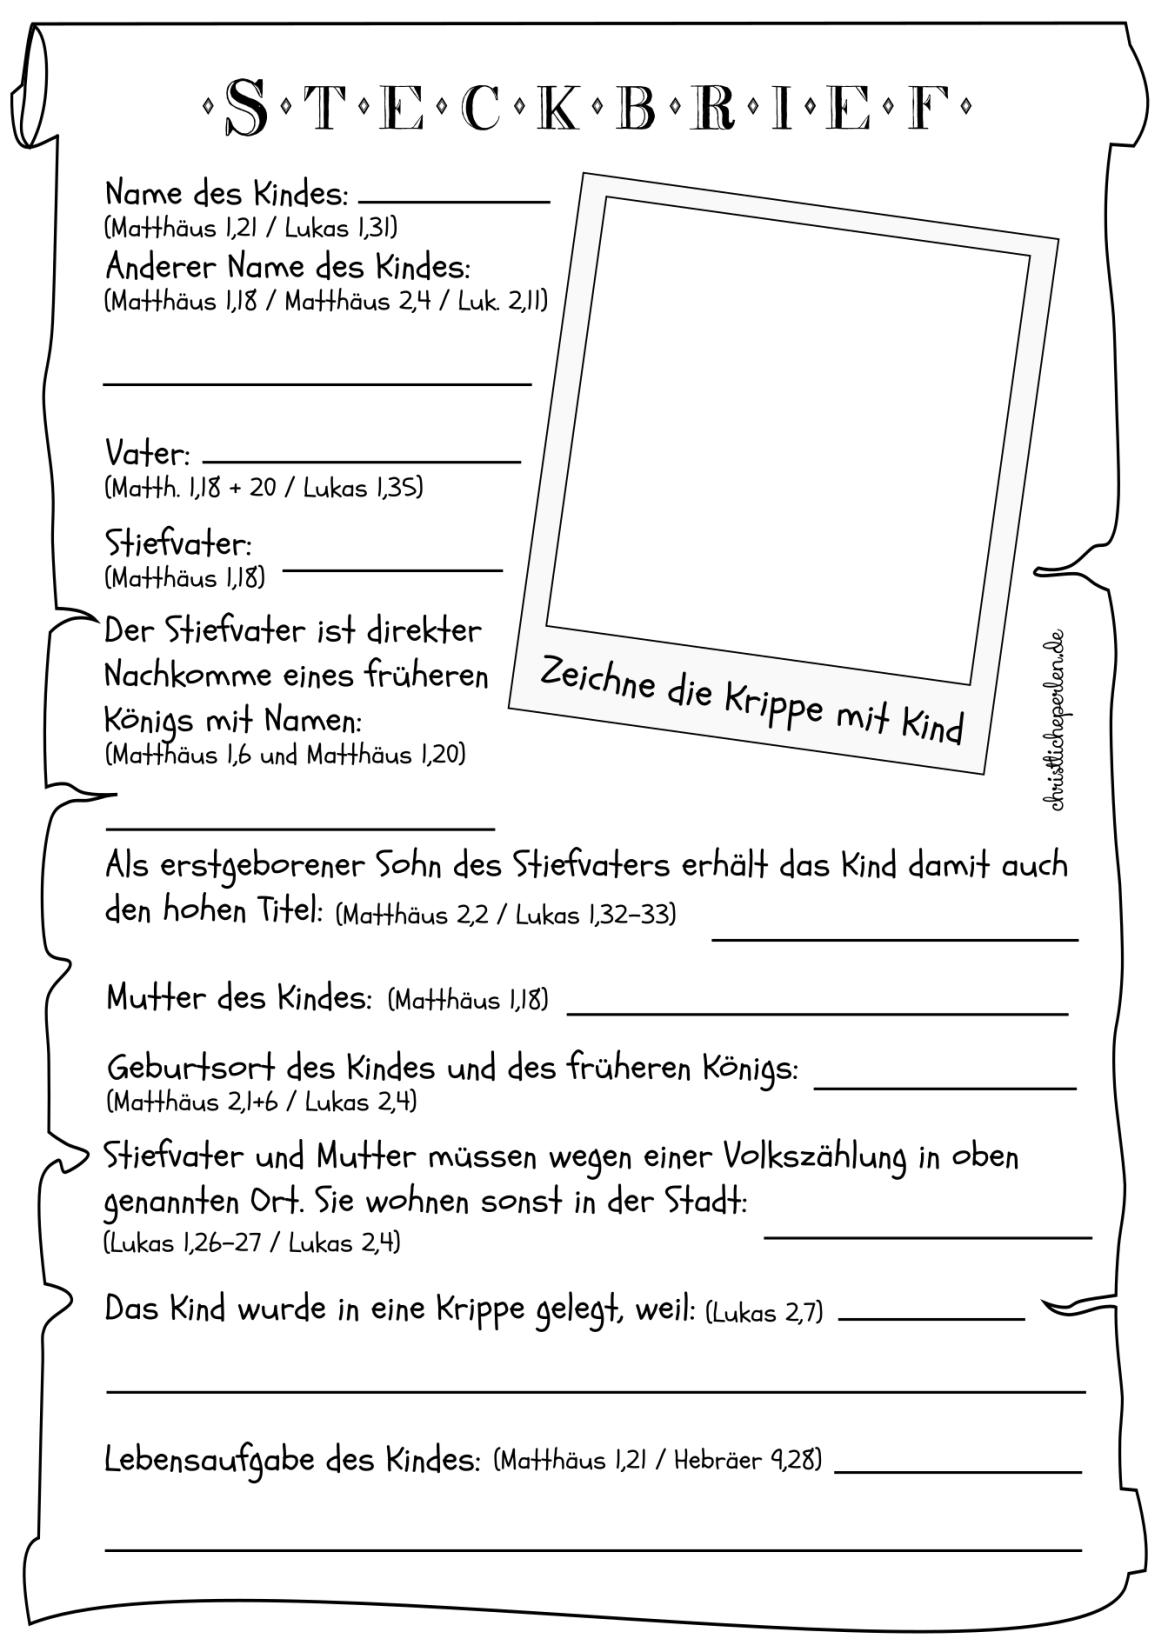 Buchstabenratsel Zum Ausdrucken Raetseldino De In 2020 Ratsel Zum Ausdrucken Buchstabenratsel Buchstaben